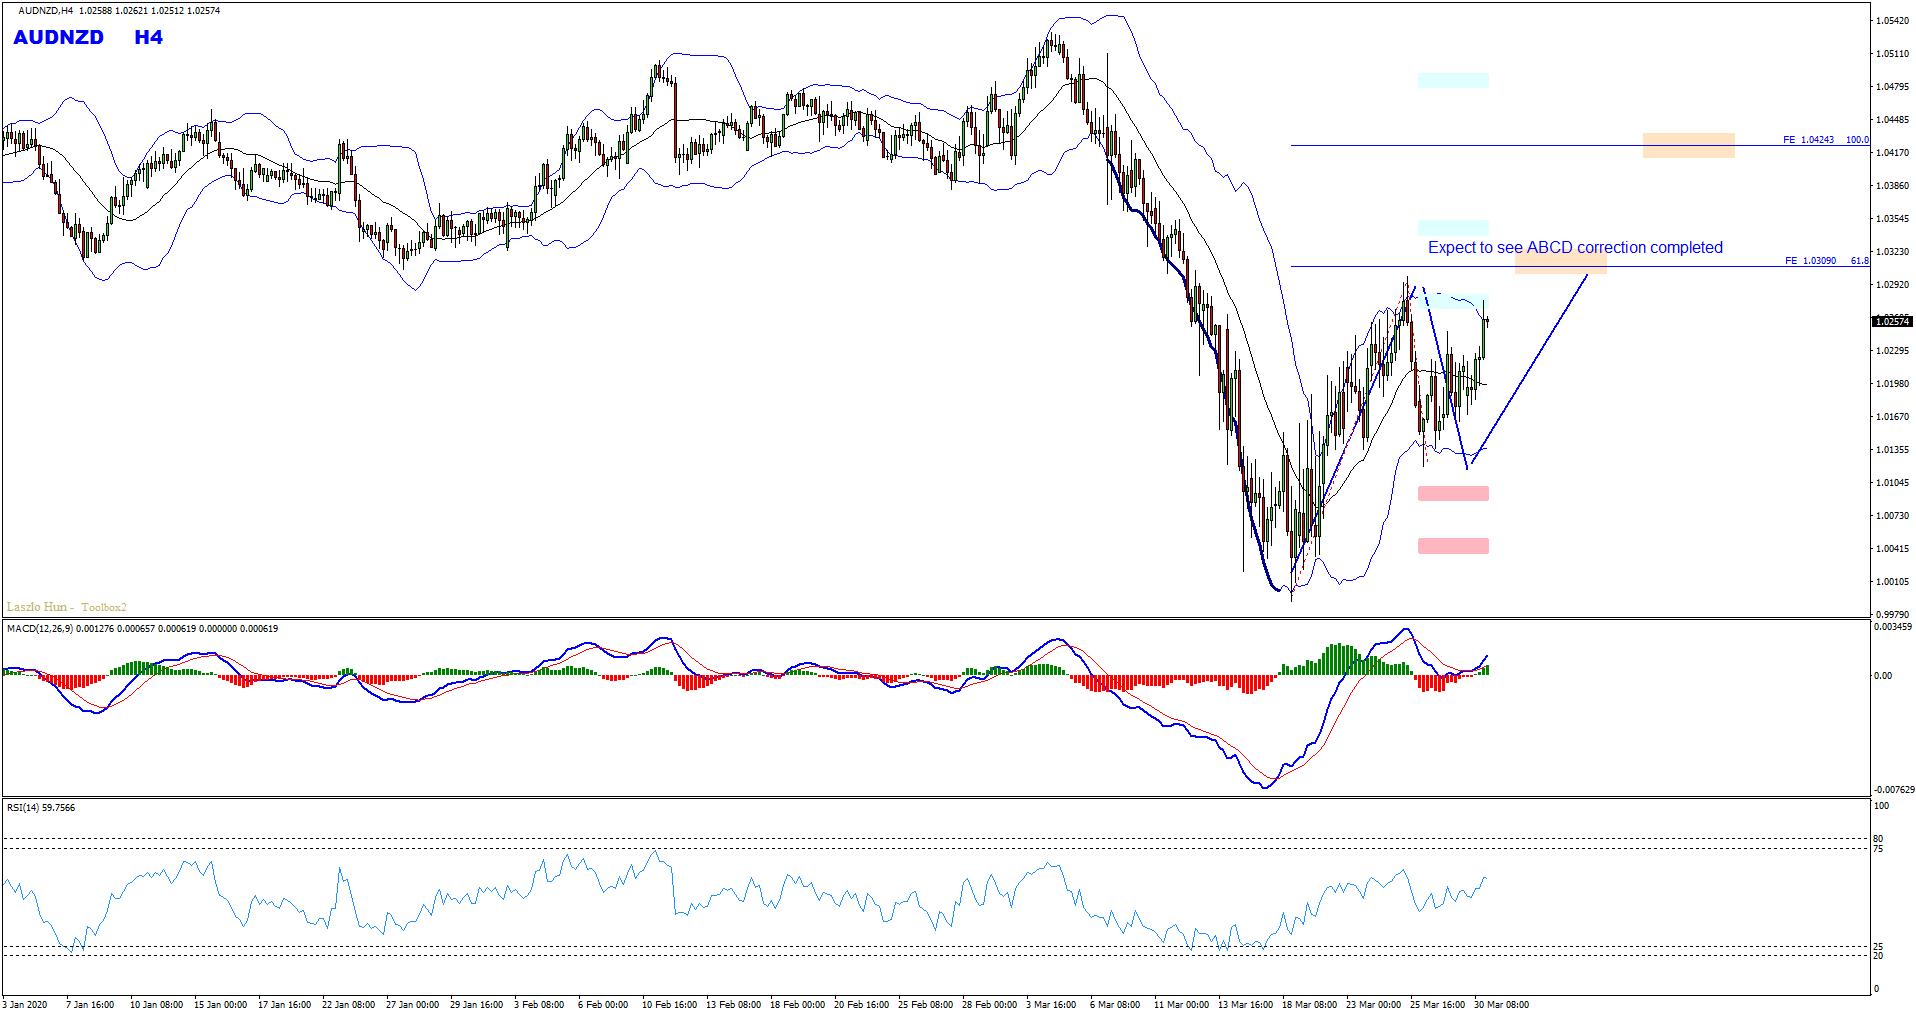 Technical Analysis - AUDNZD Forecast Follow Up